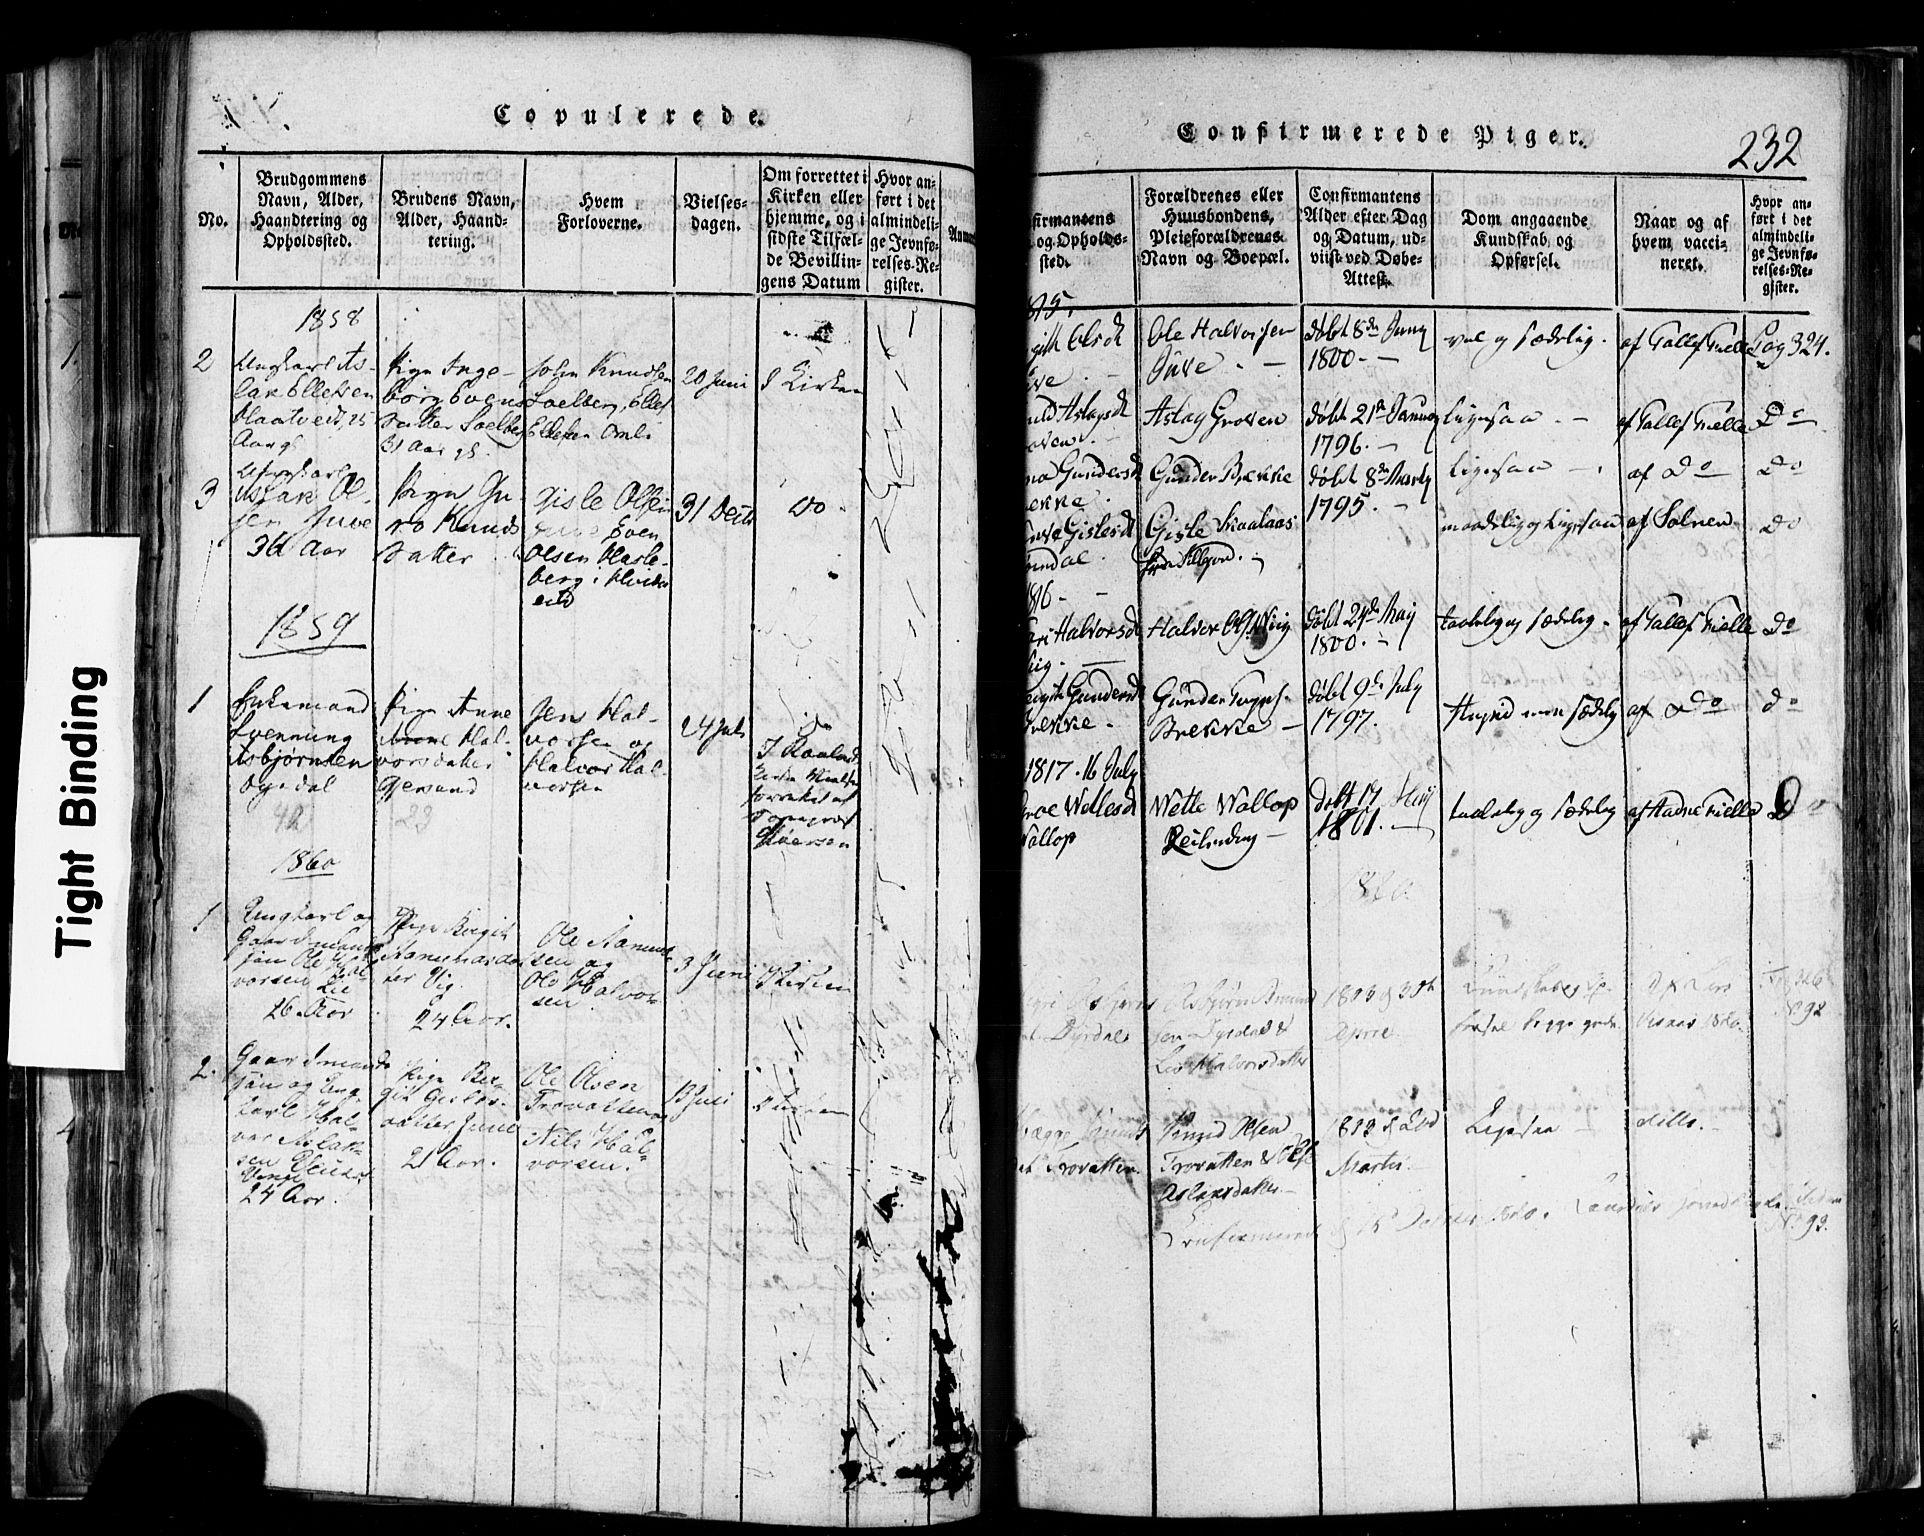 SAKO, Rauland kirkebøker, F/Fa/L0002: Ministerialbok nr. 2, 1815-1860, s. 232